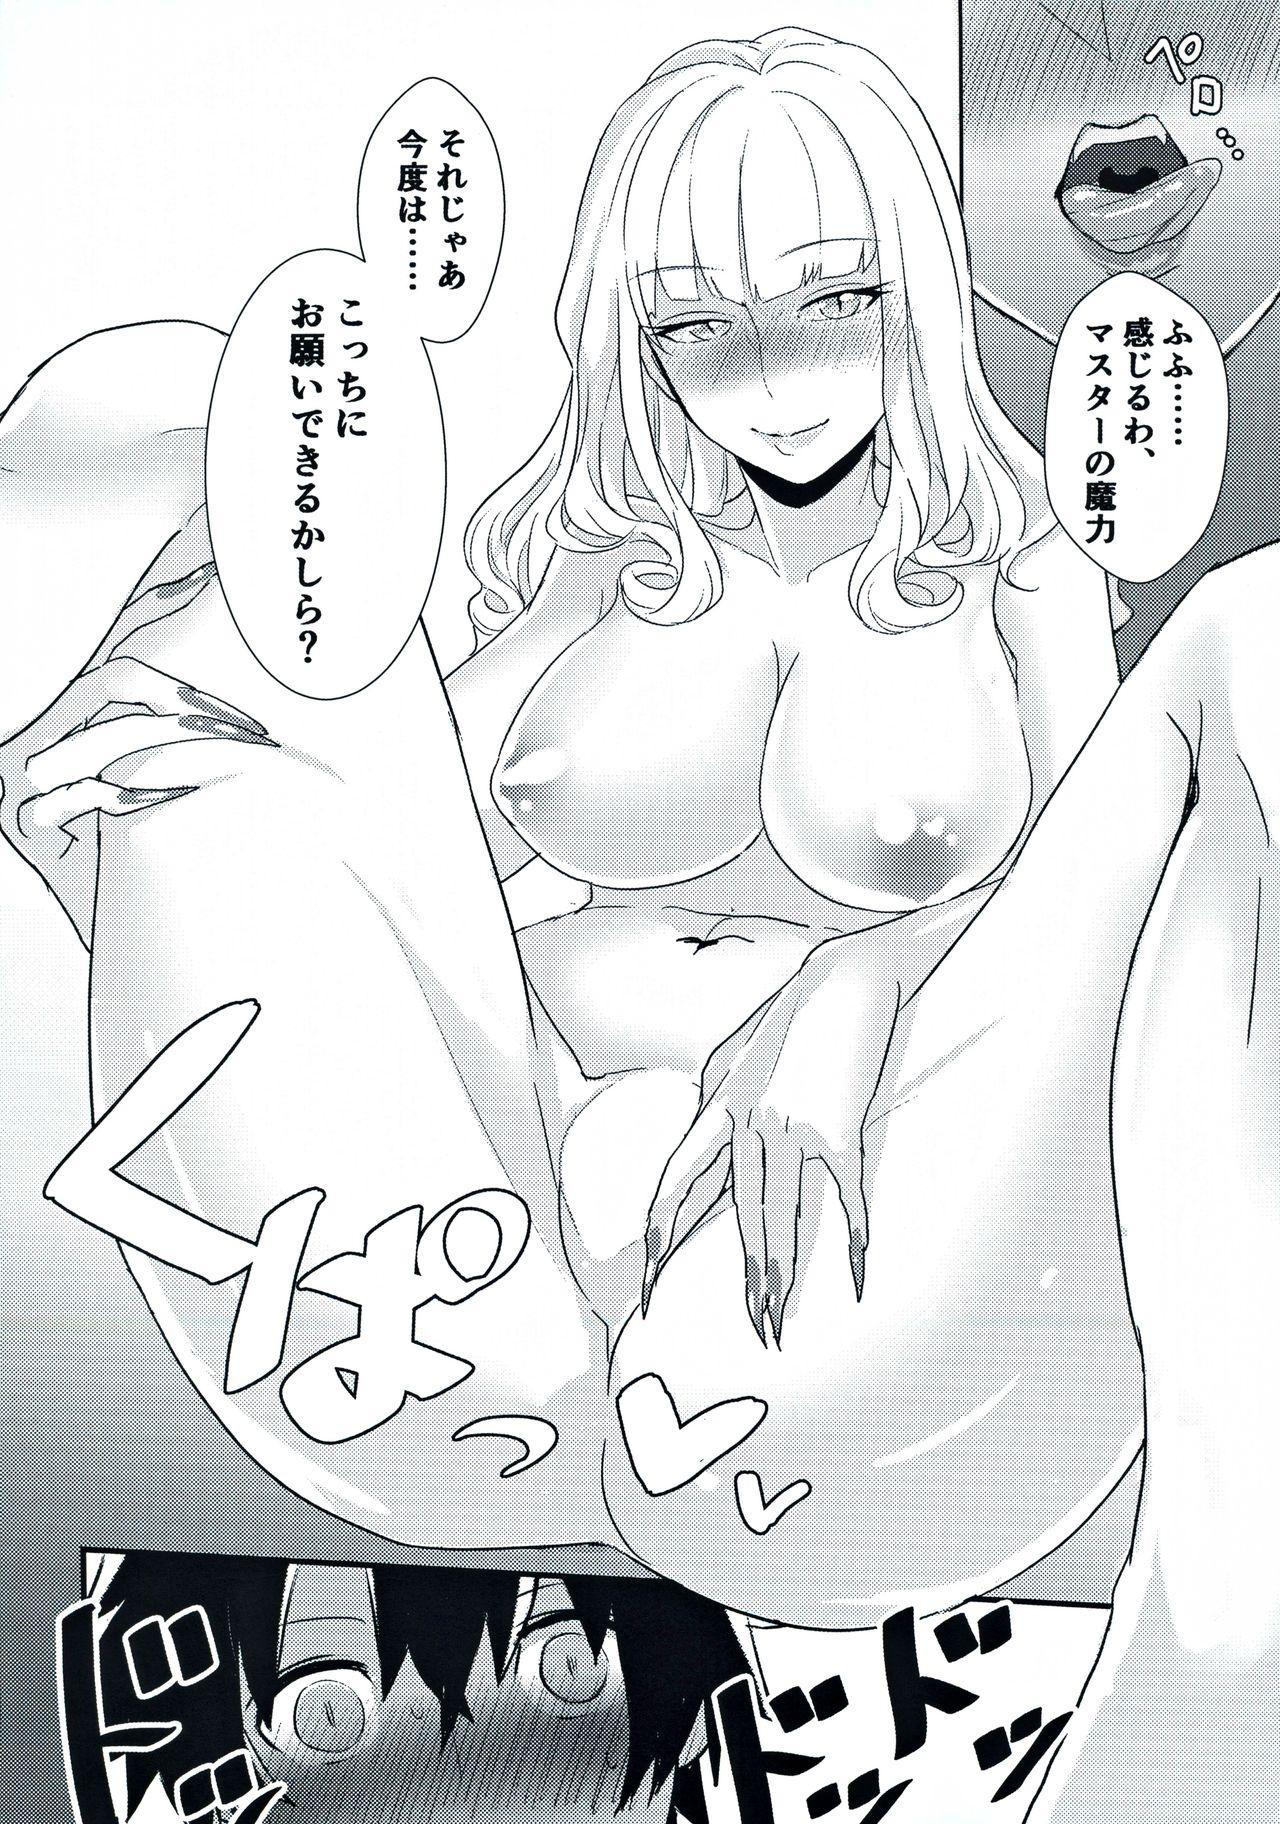 Carmilla-san to Ichaicha Shitai! 12